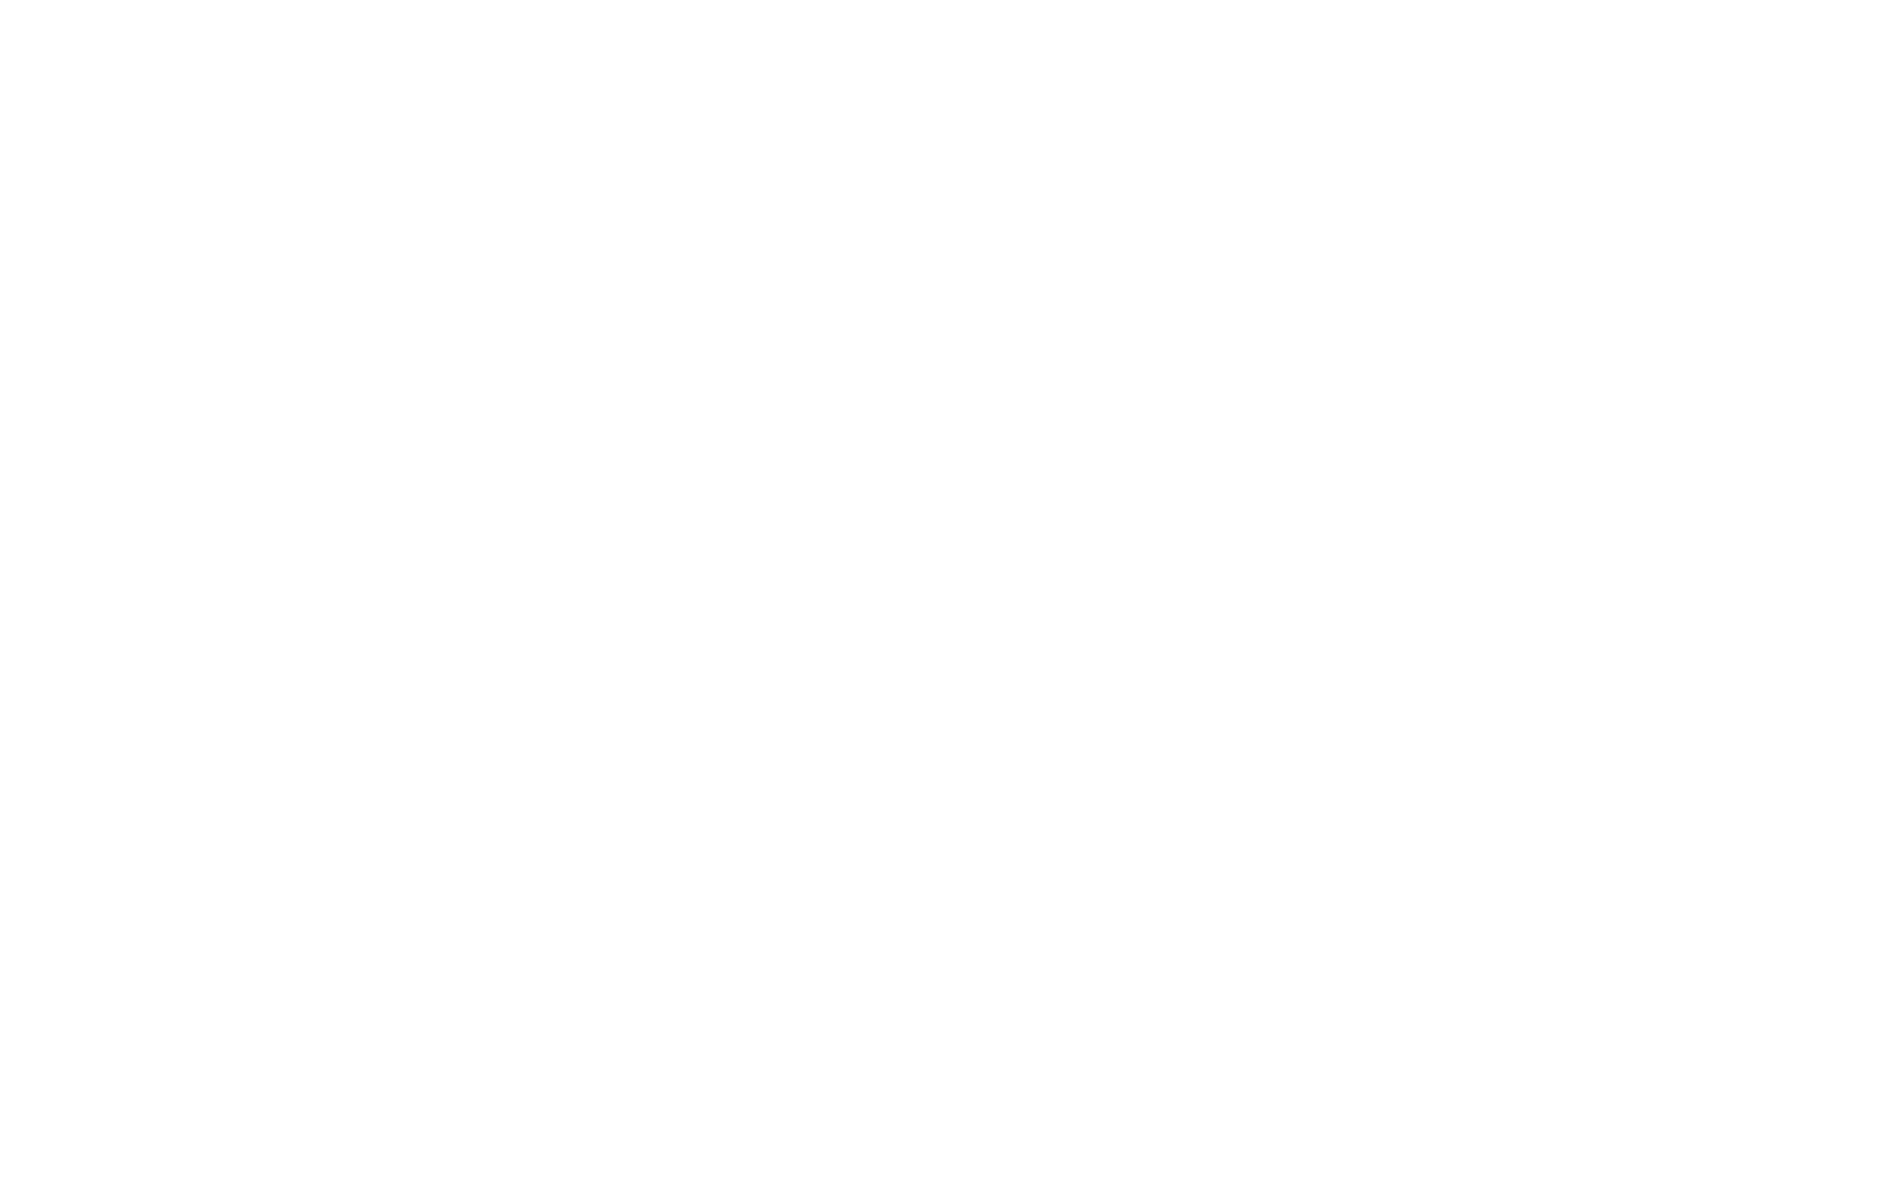 C101 cope and stick cabinet door configuration